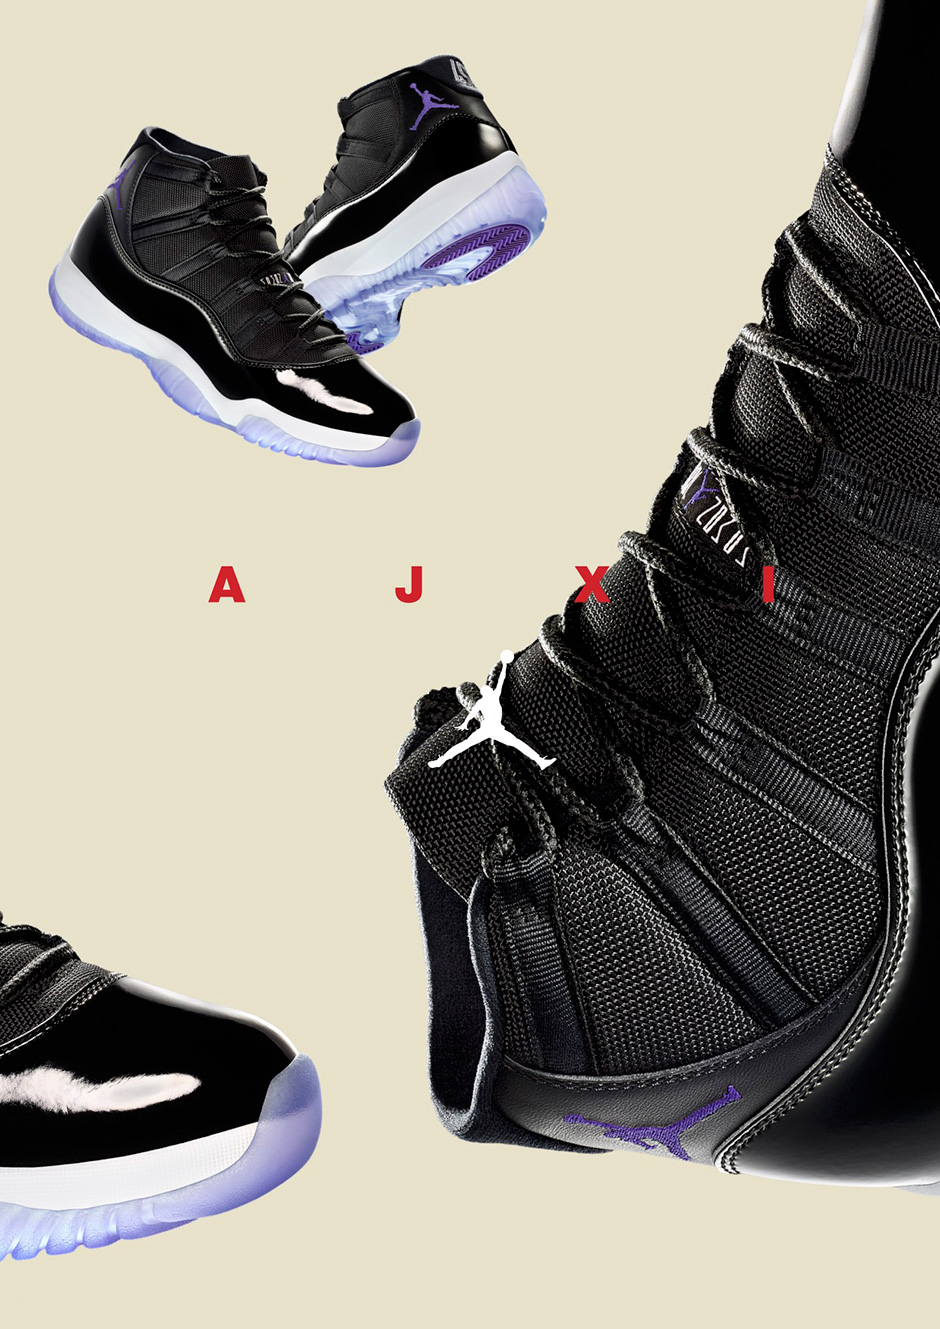 645a32710f4 Space Jam Jordan 11 - Official Release Info